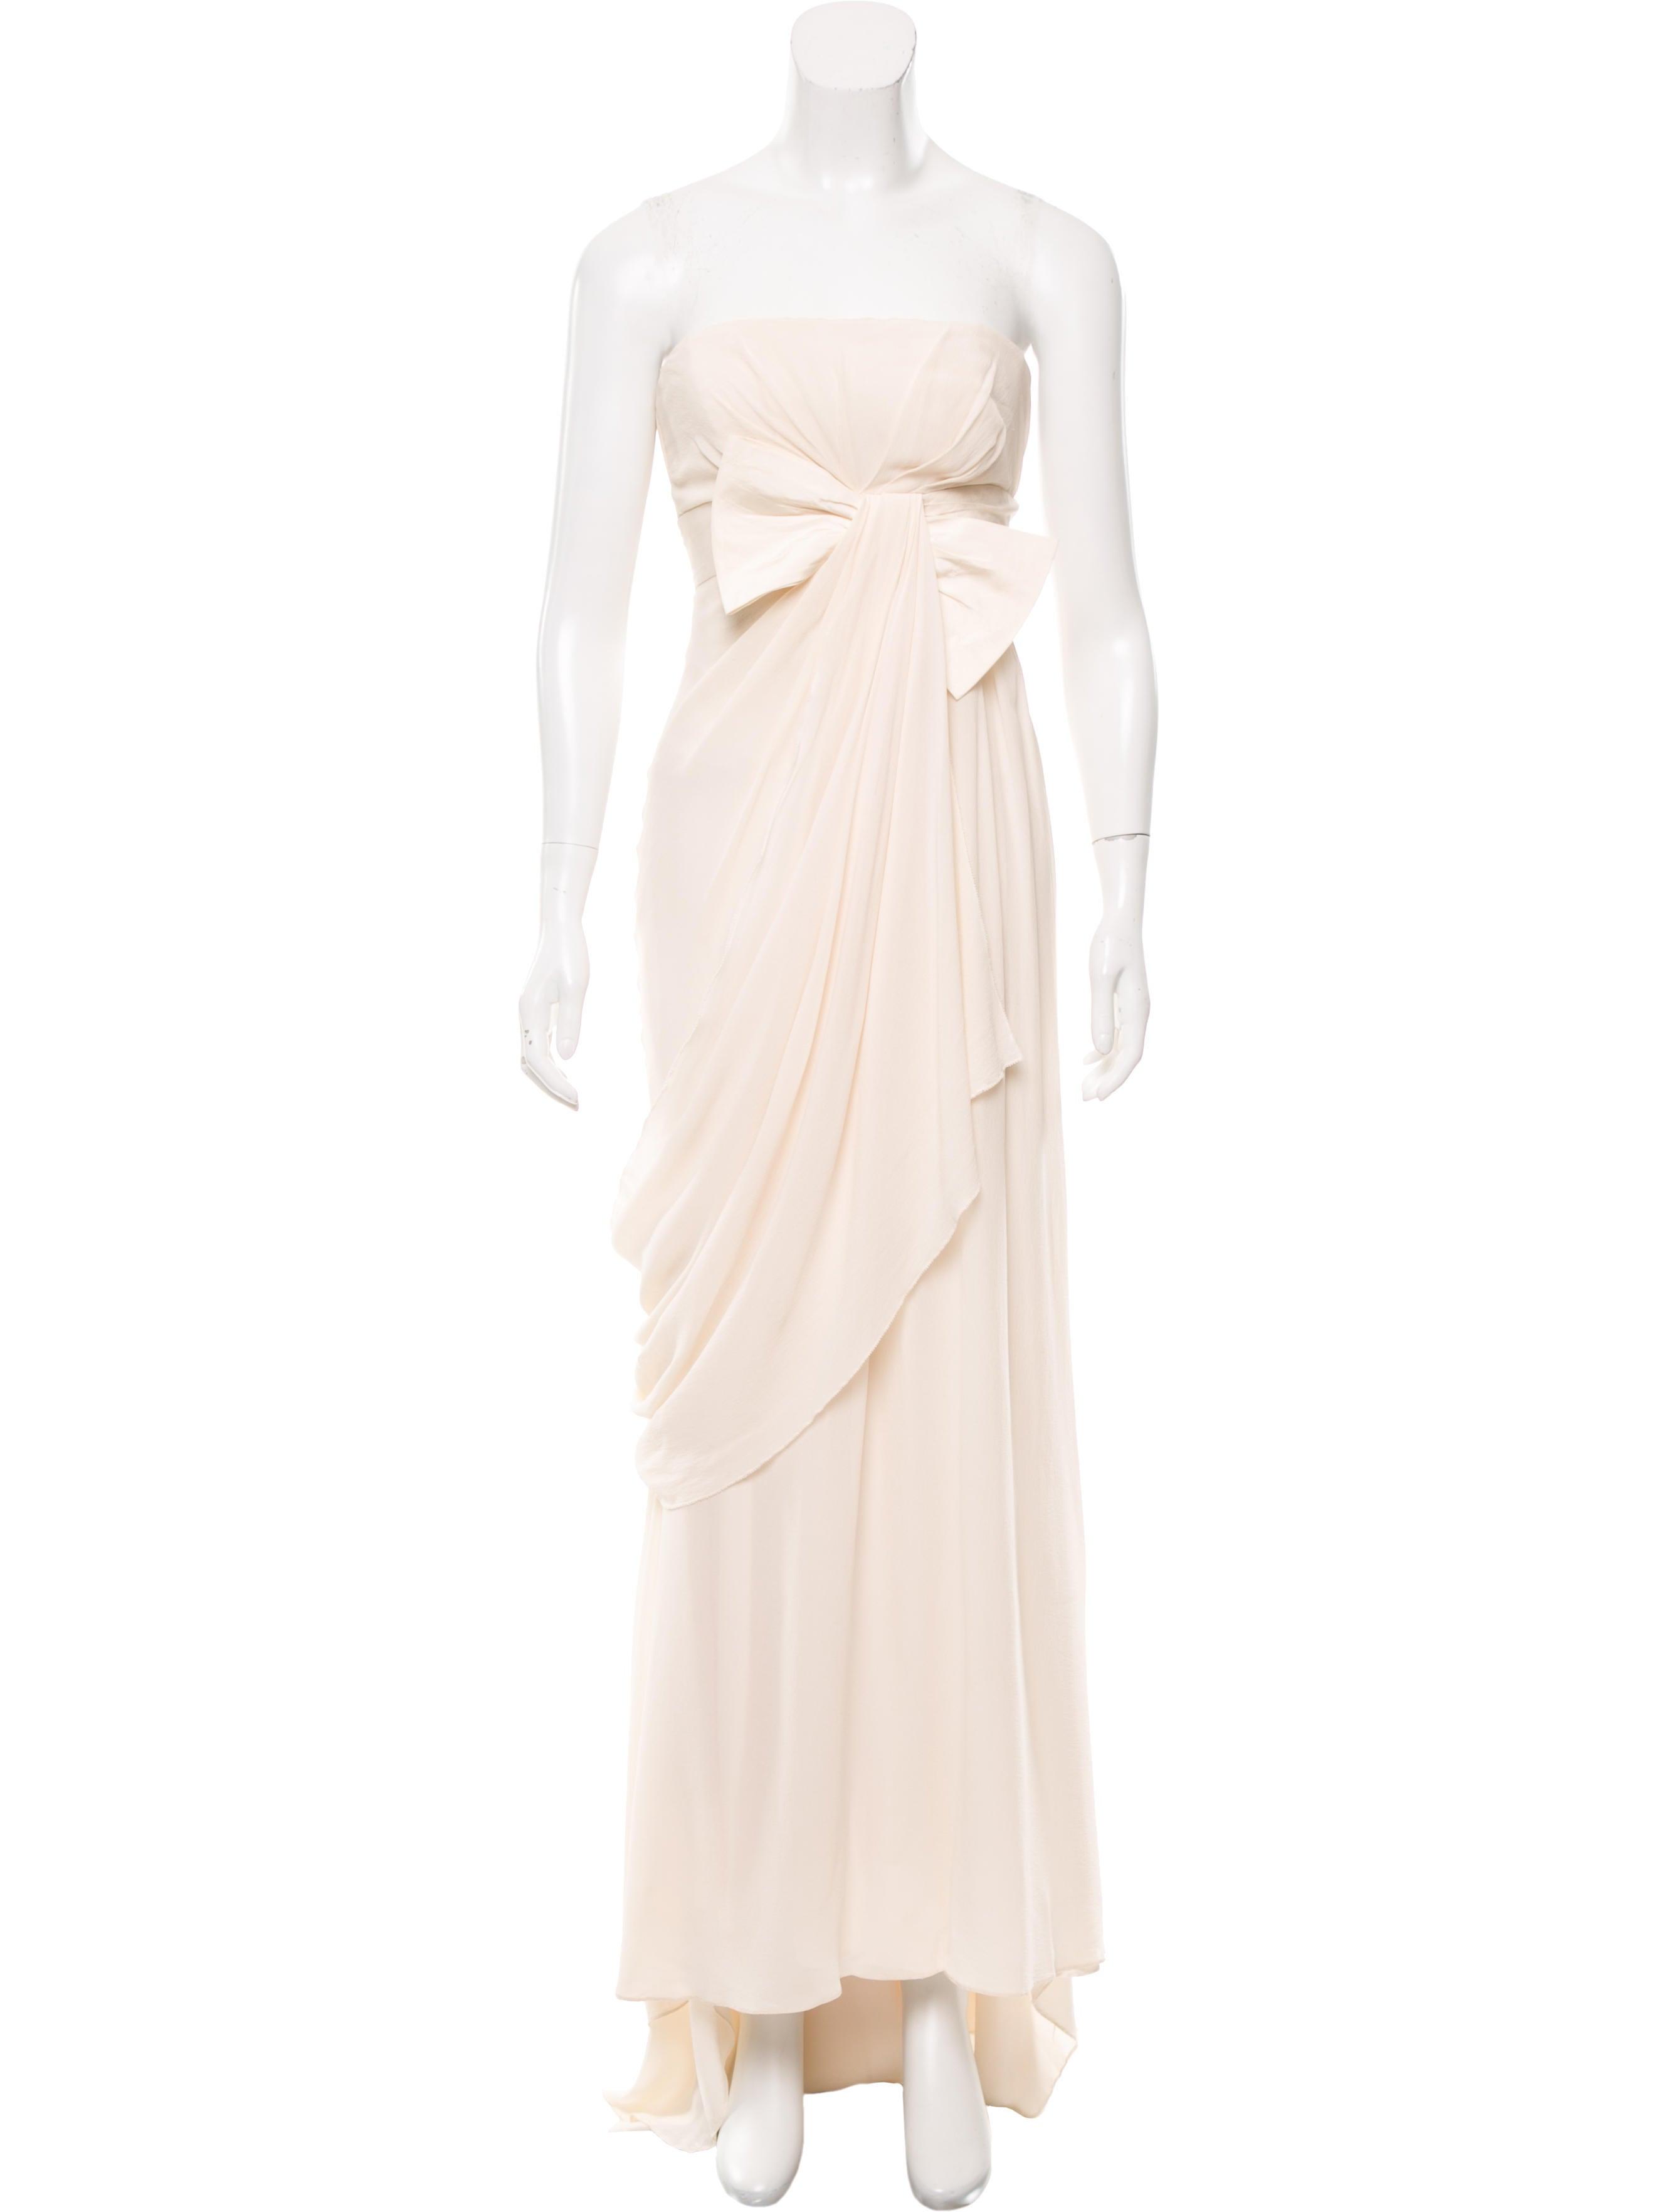 Vera wang draped wedding dress clothing ver25052 the for Vera wang wedding dresses outlet